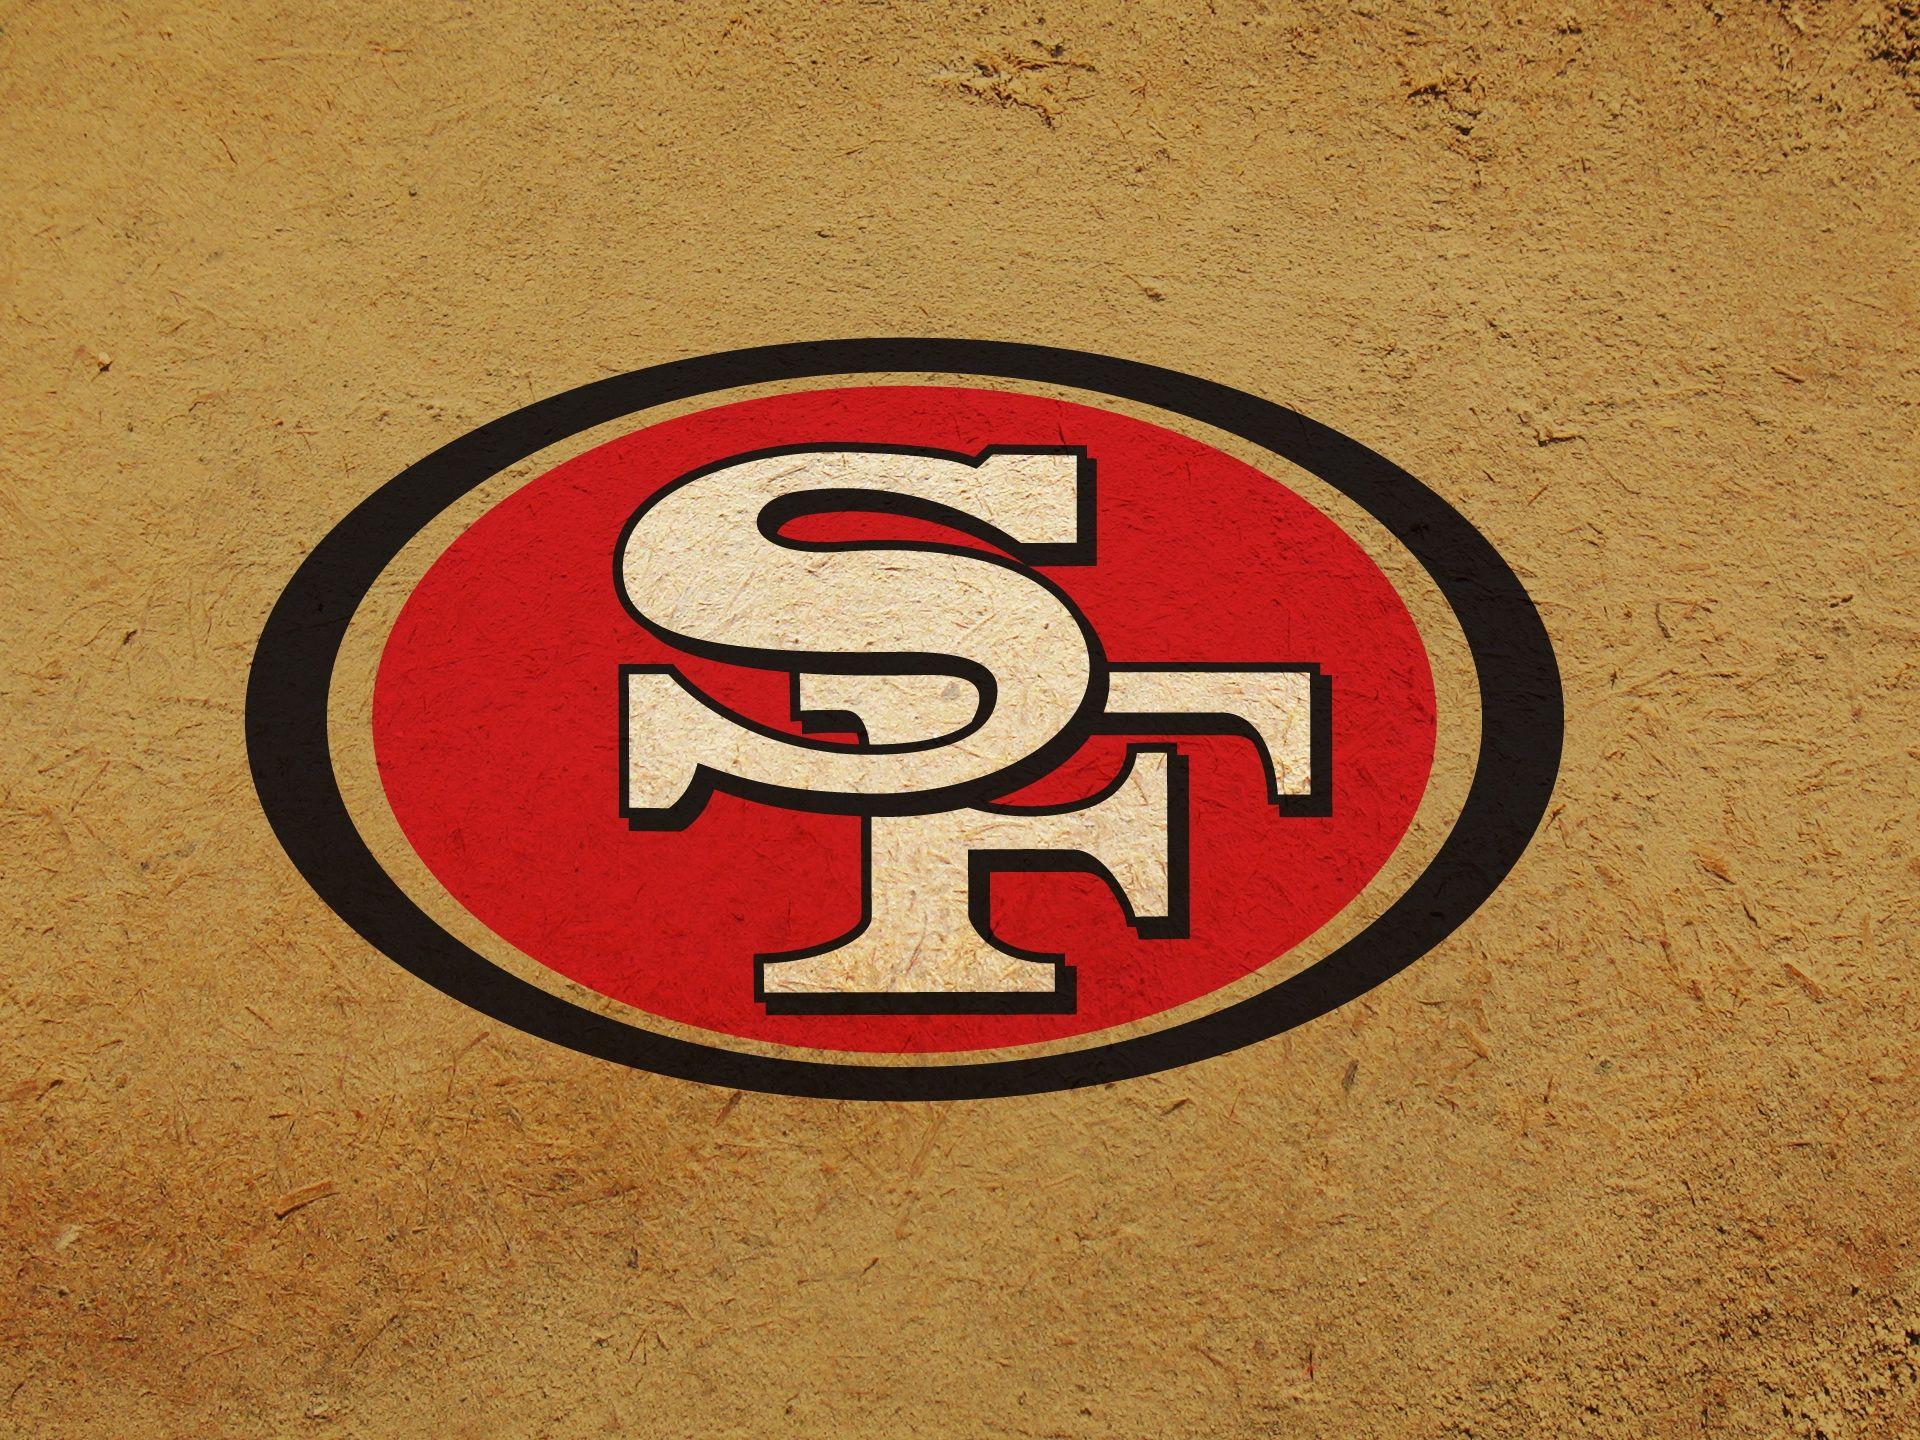 San Francisco 49ers. Wallpaper. Equipo de fútbol americano.  acb3c111bfcfd